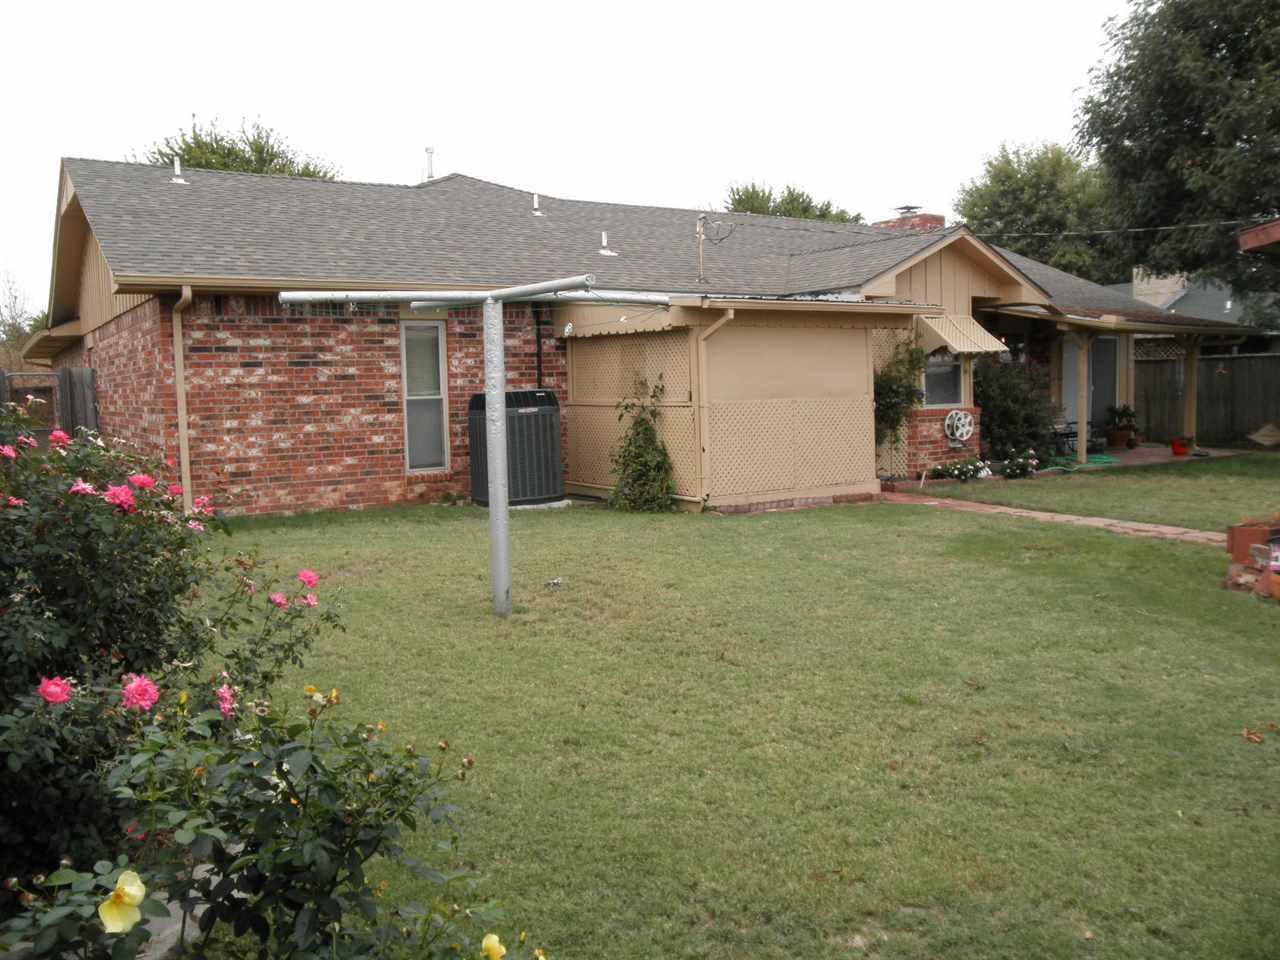 Sold Cross Sale W/ MLS | 2516 Oriole  Ponca City, OK 74601 22